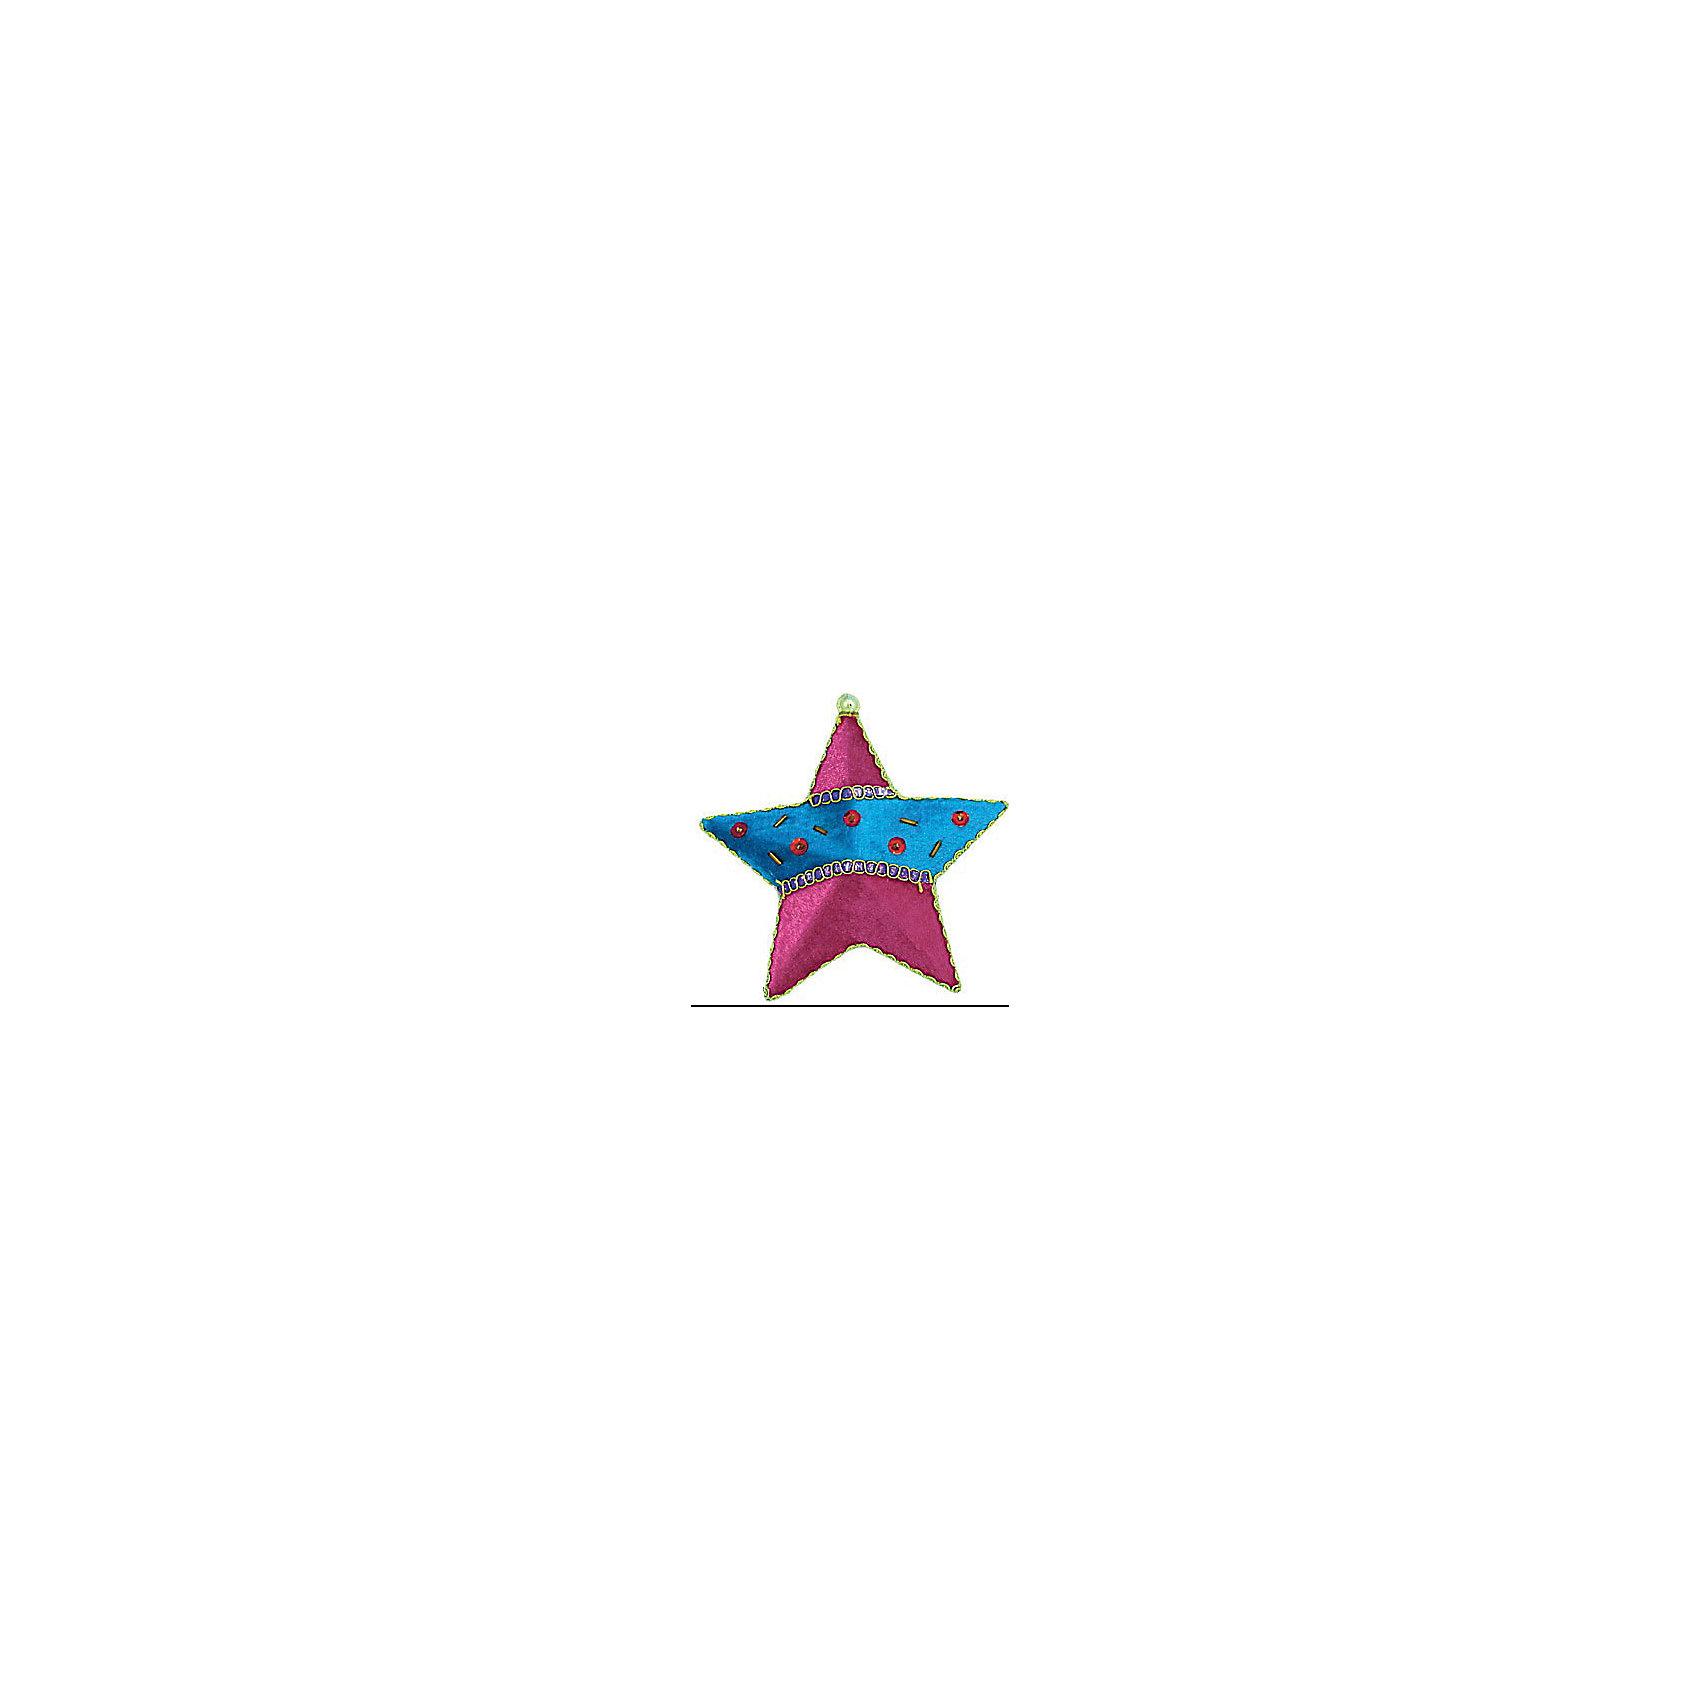 Marko Ferenzo Украшение  Детский: звезда флок, 13 см елочное украшение носок marko ferenzo